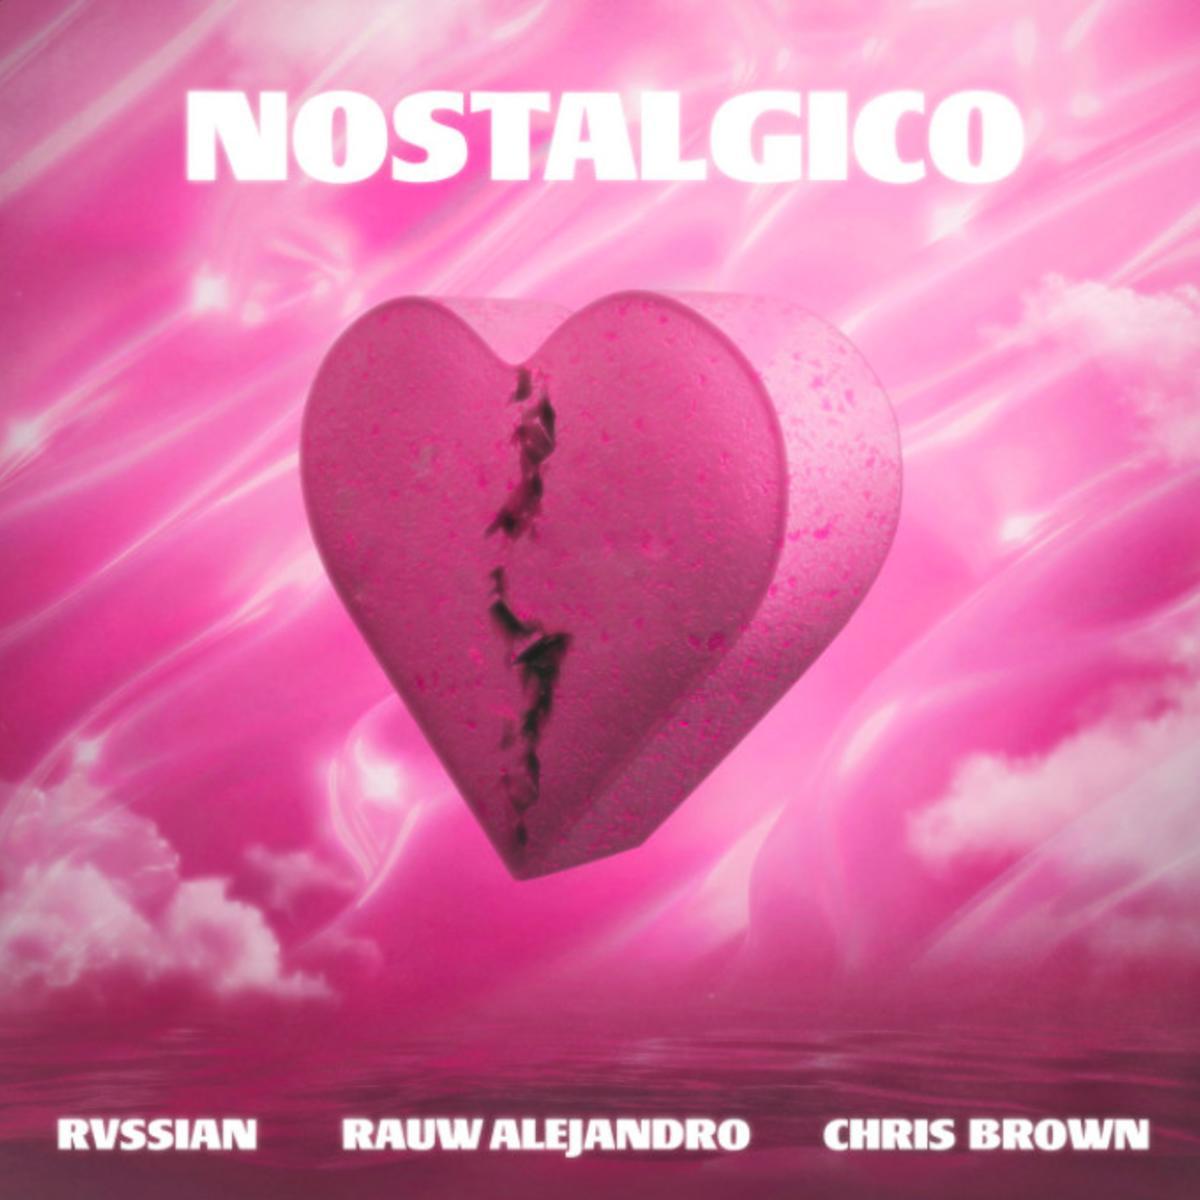 Rauw Alejandro & Rvssian Ft. Chris Brown - Nostálgico Mp3